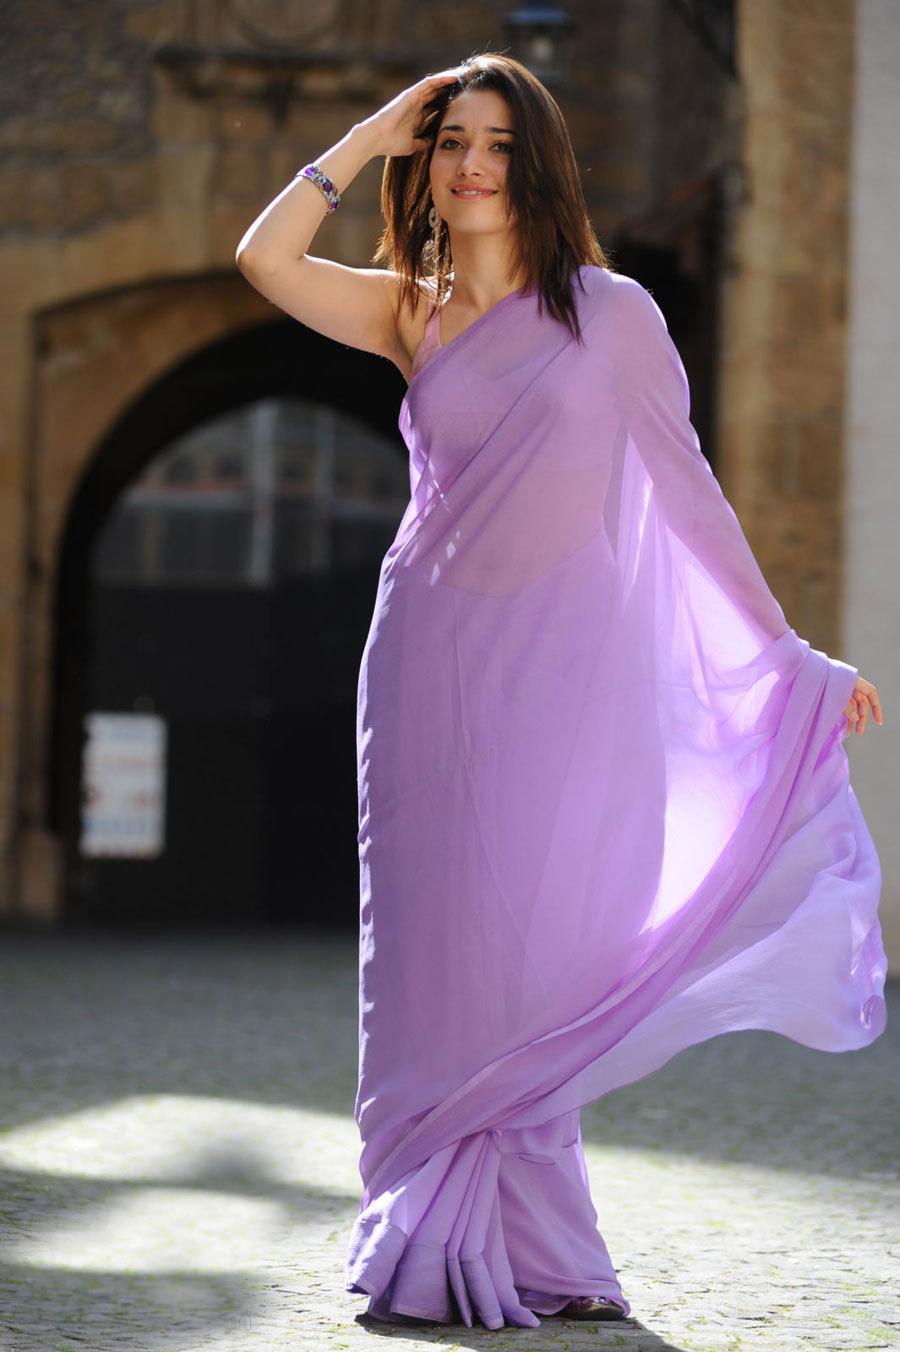 Tamanna Back: Tamanna Bhatia In Purple Backless Saree